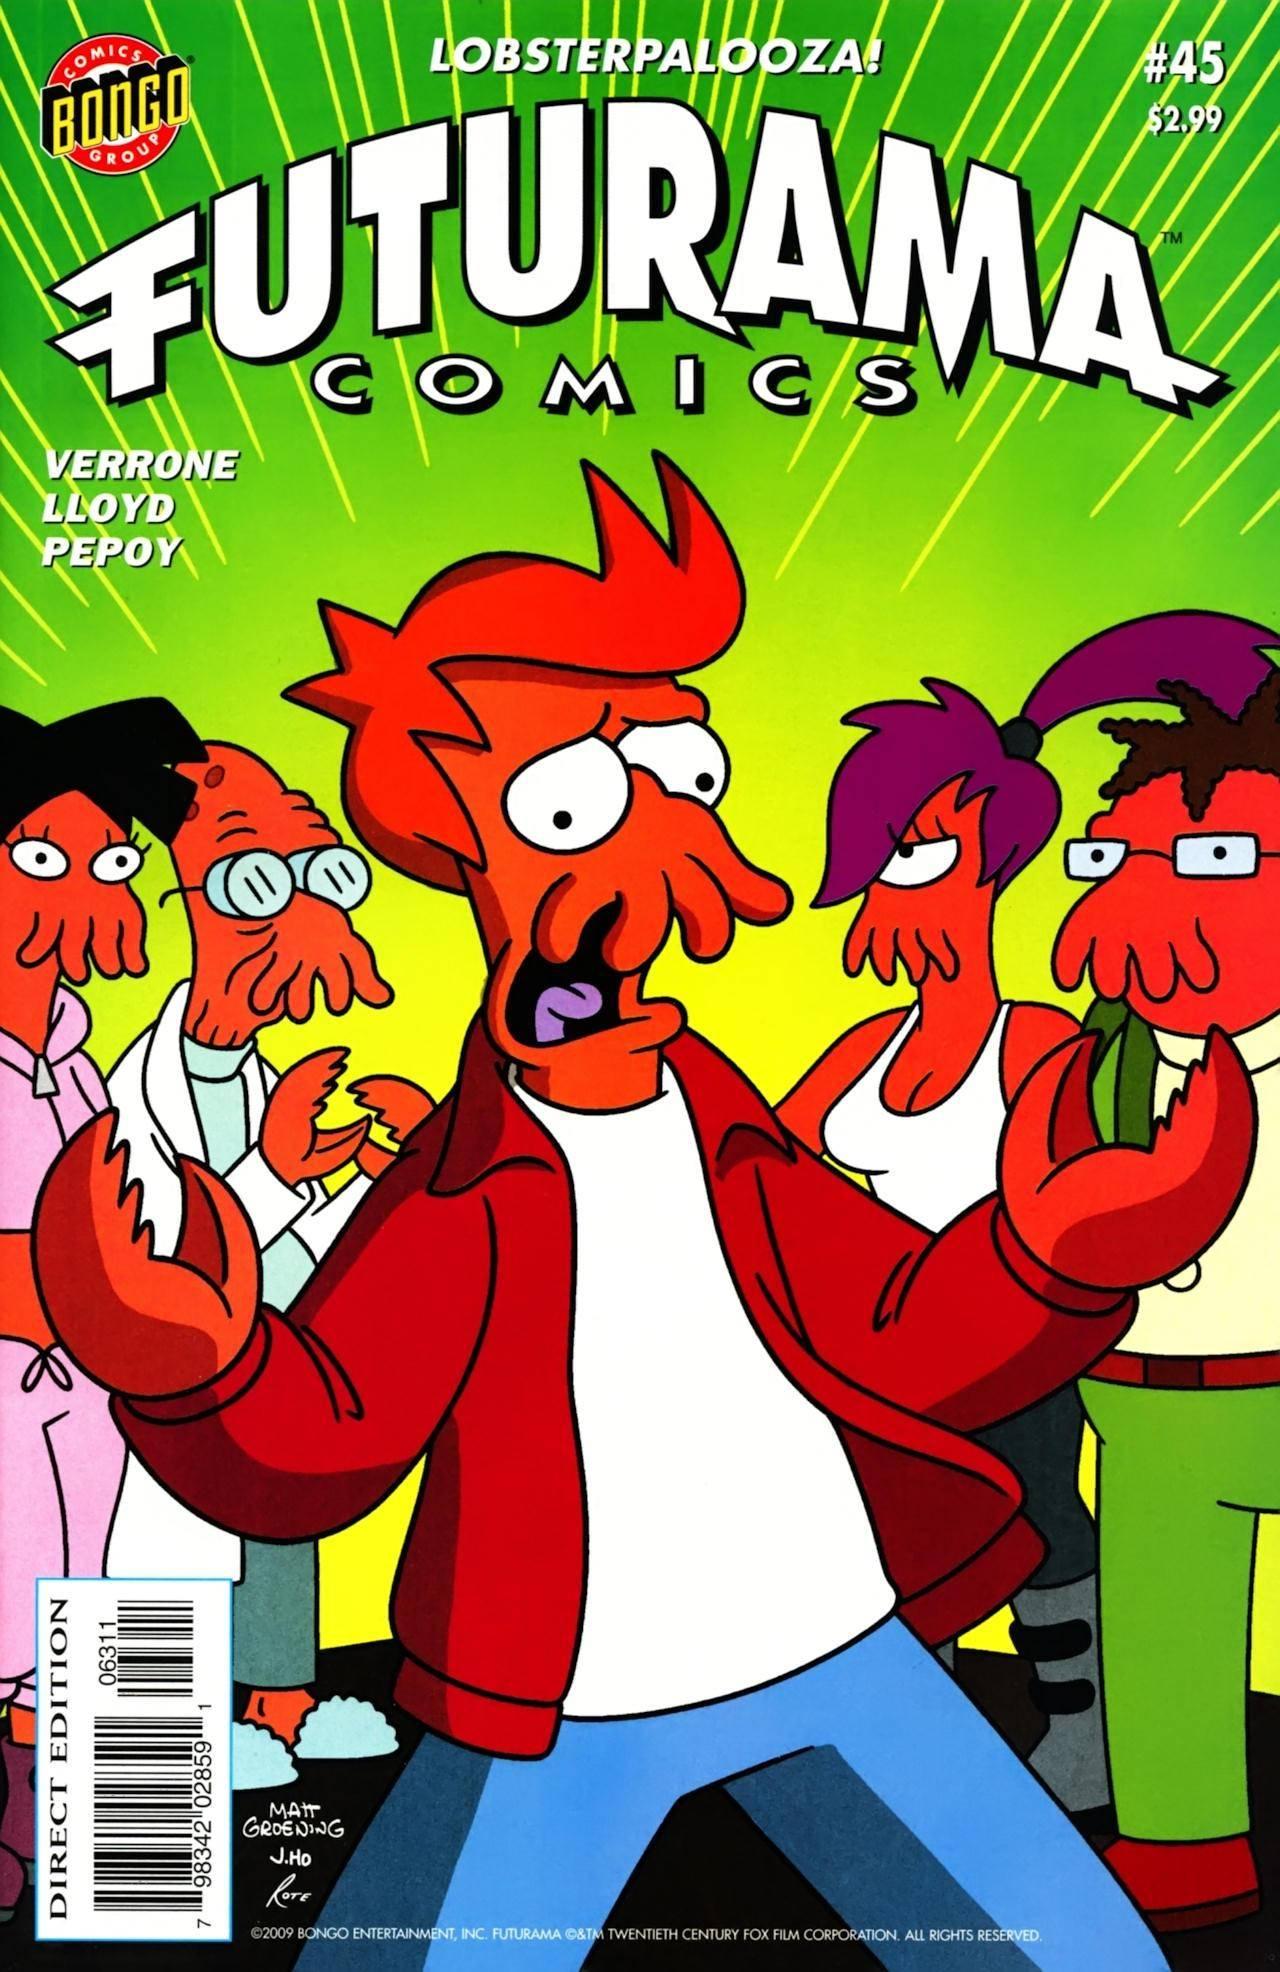 Futurama Comics 045 - Anthology of Interest II